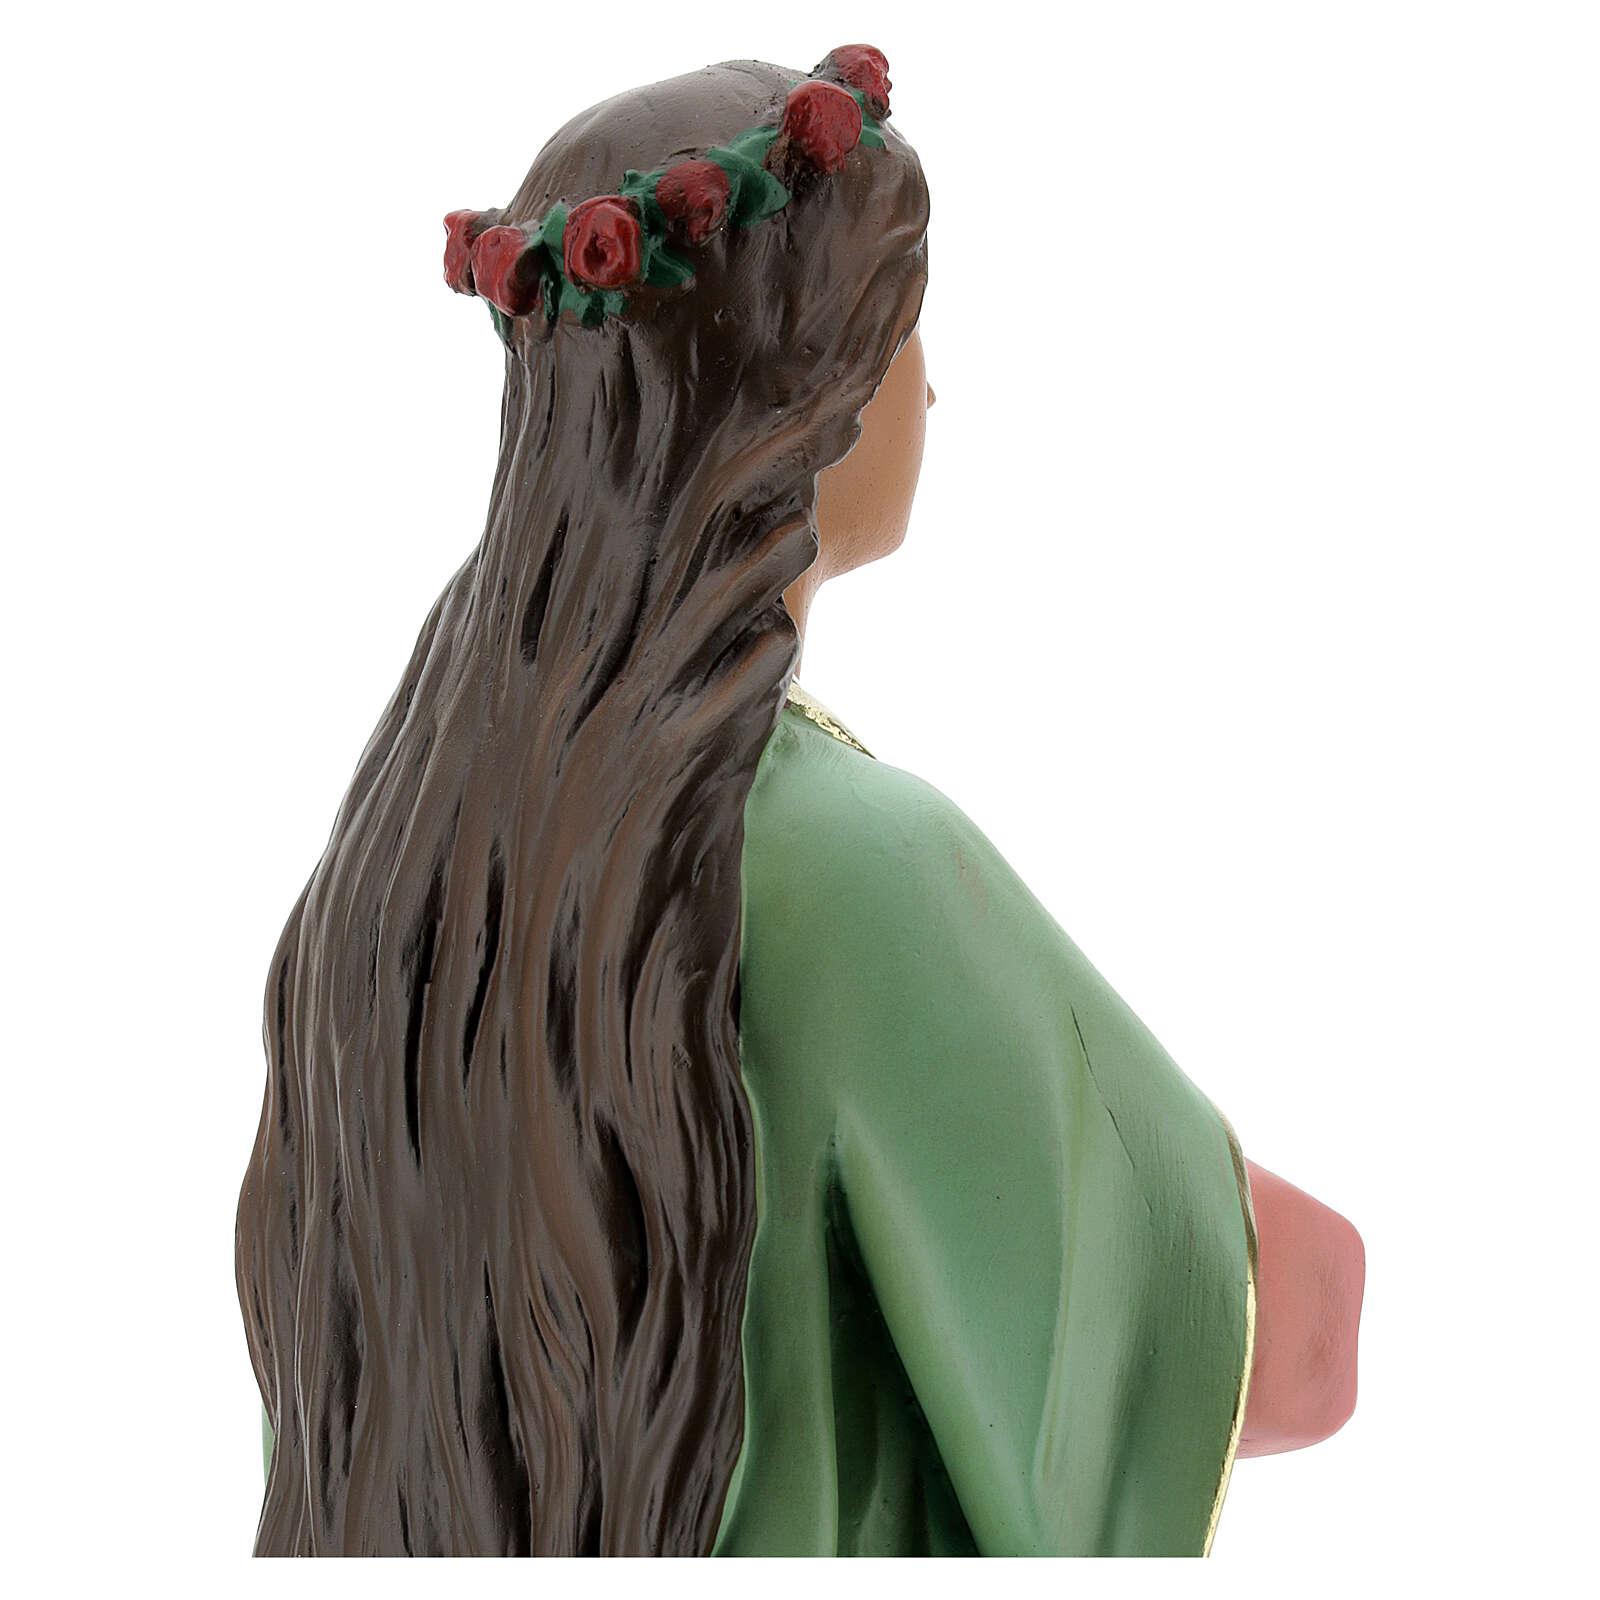 Santa Agnese statua gesso 40 cm dipinta a mano Arte Barsanti 4